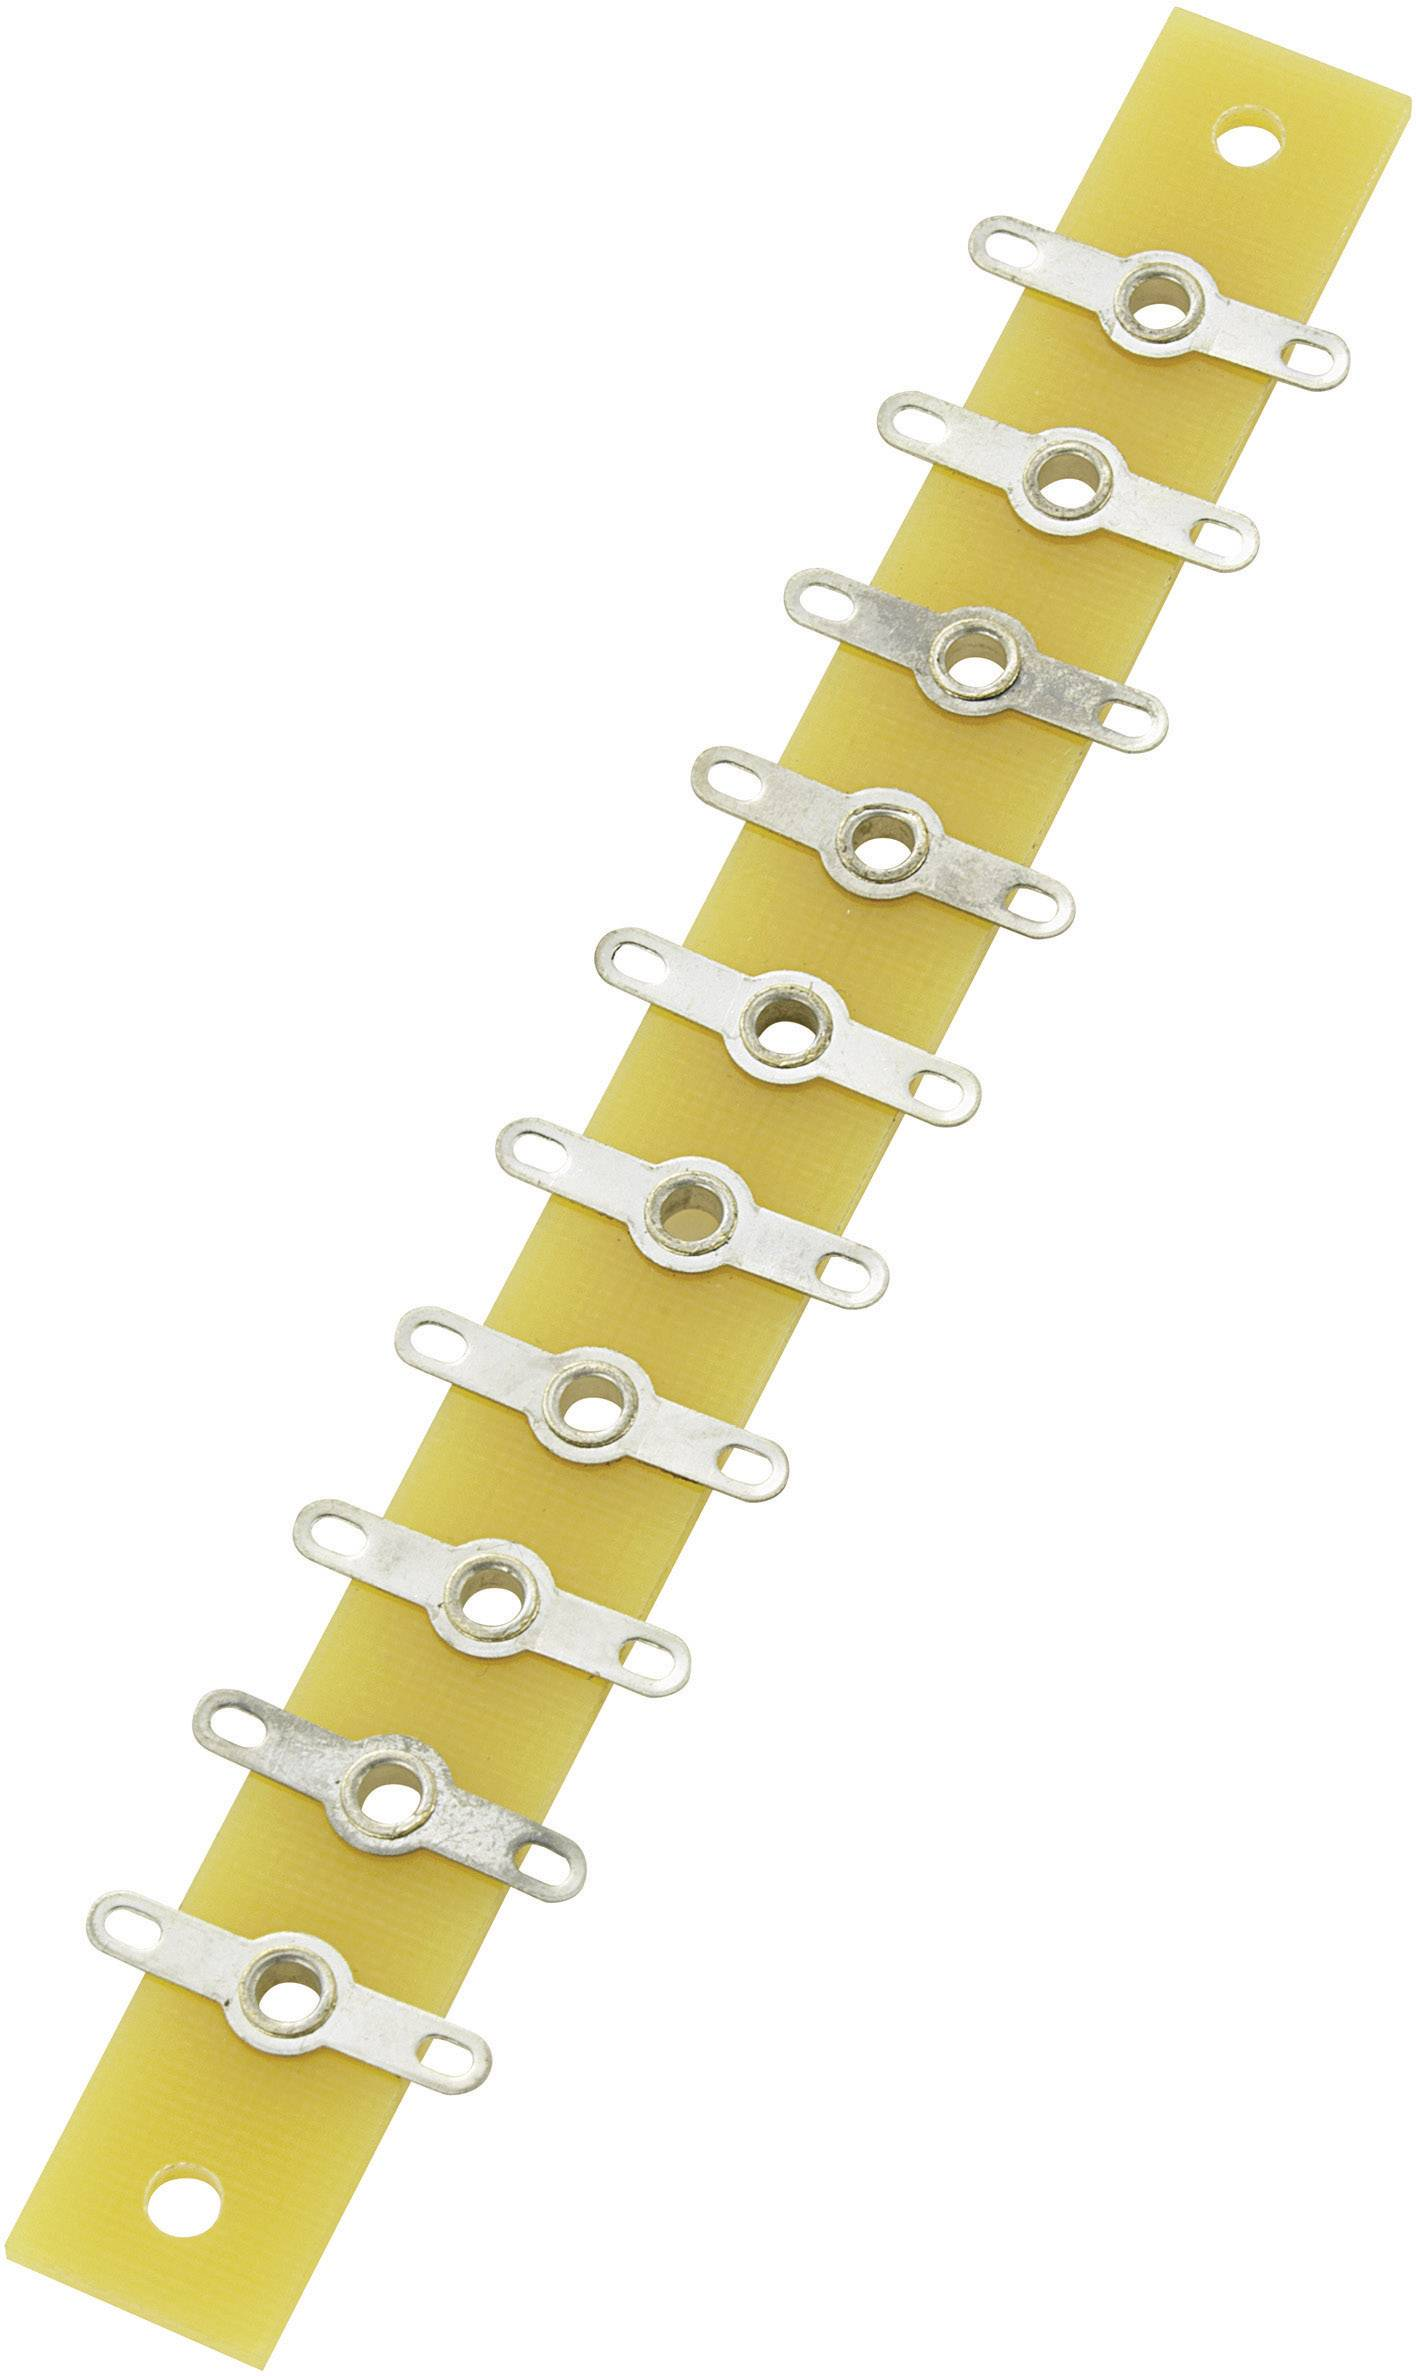 Spájkovacia lišta Conrad Components 530199, pólov 10, (d x š x v) 120 x 12 x 1.6 mm, 1 ks